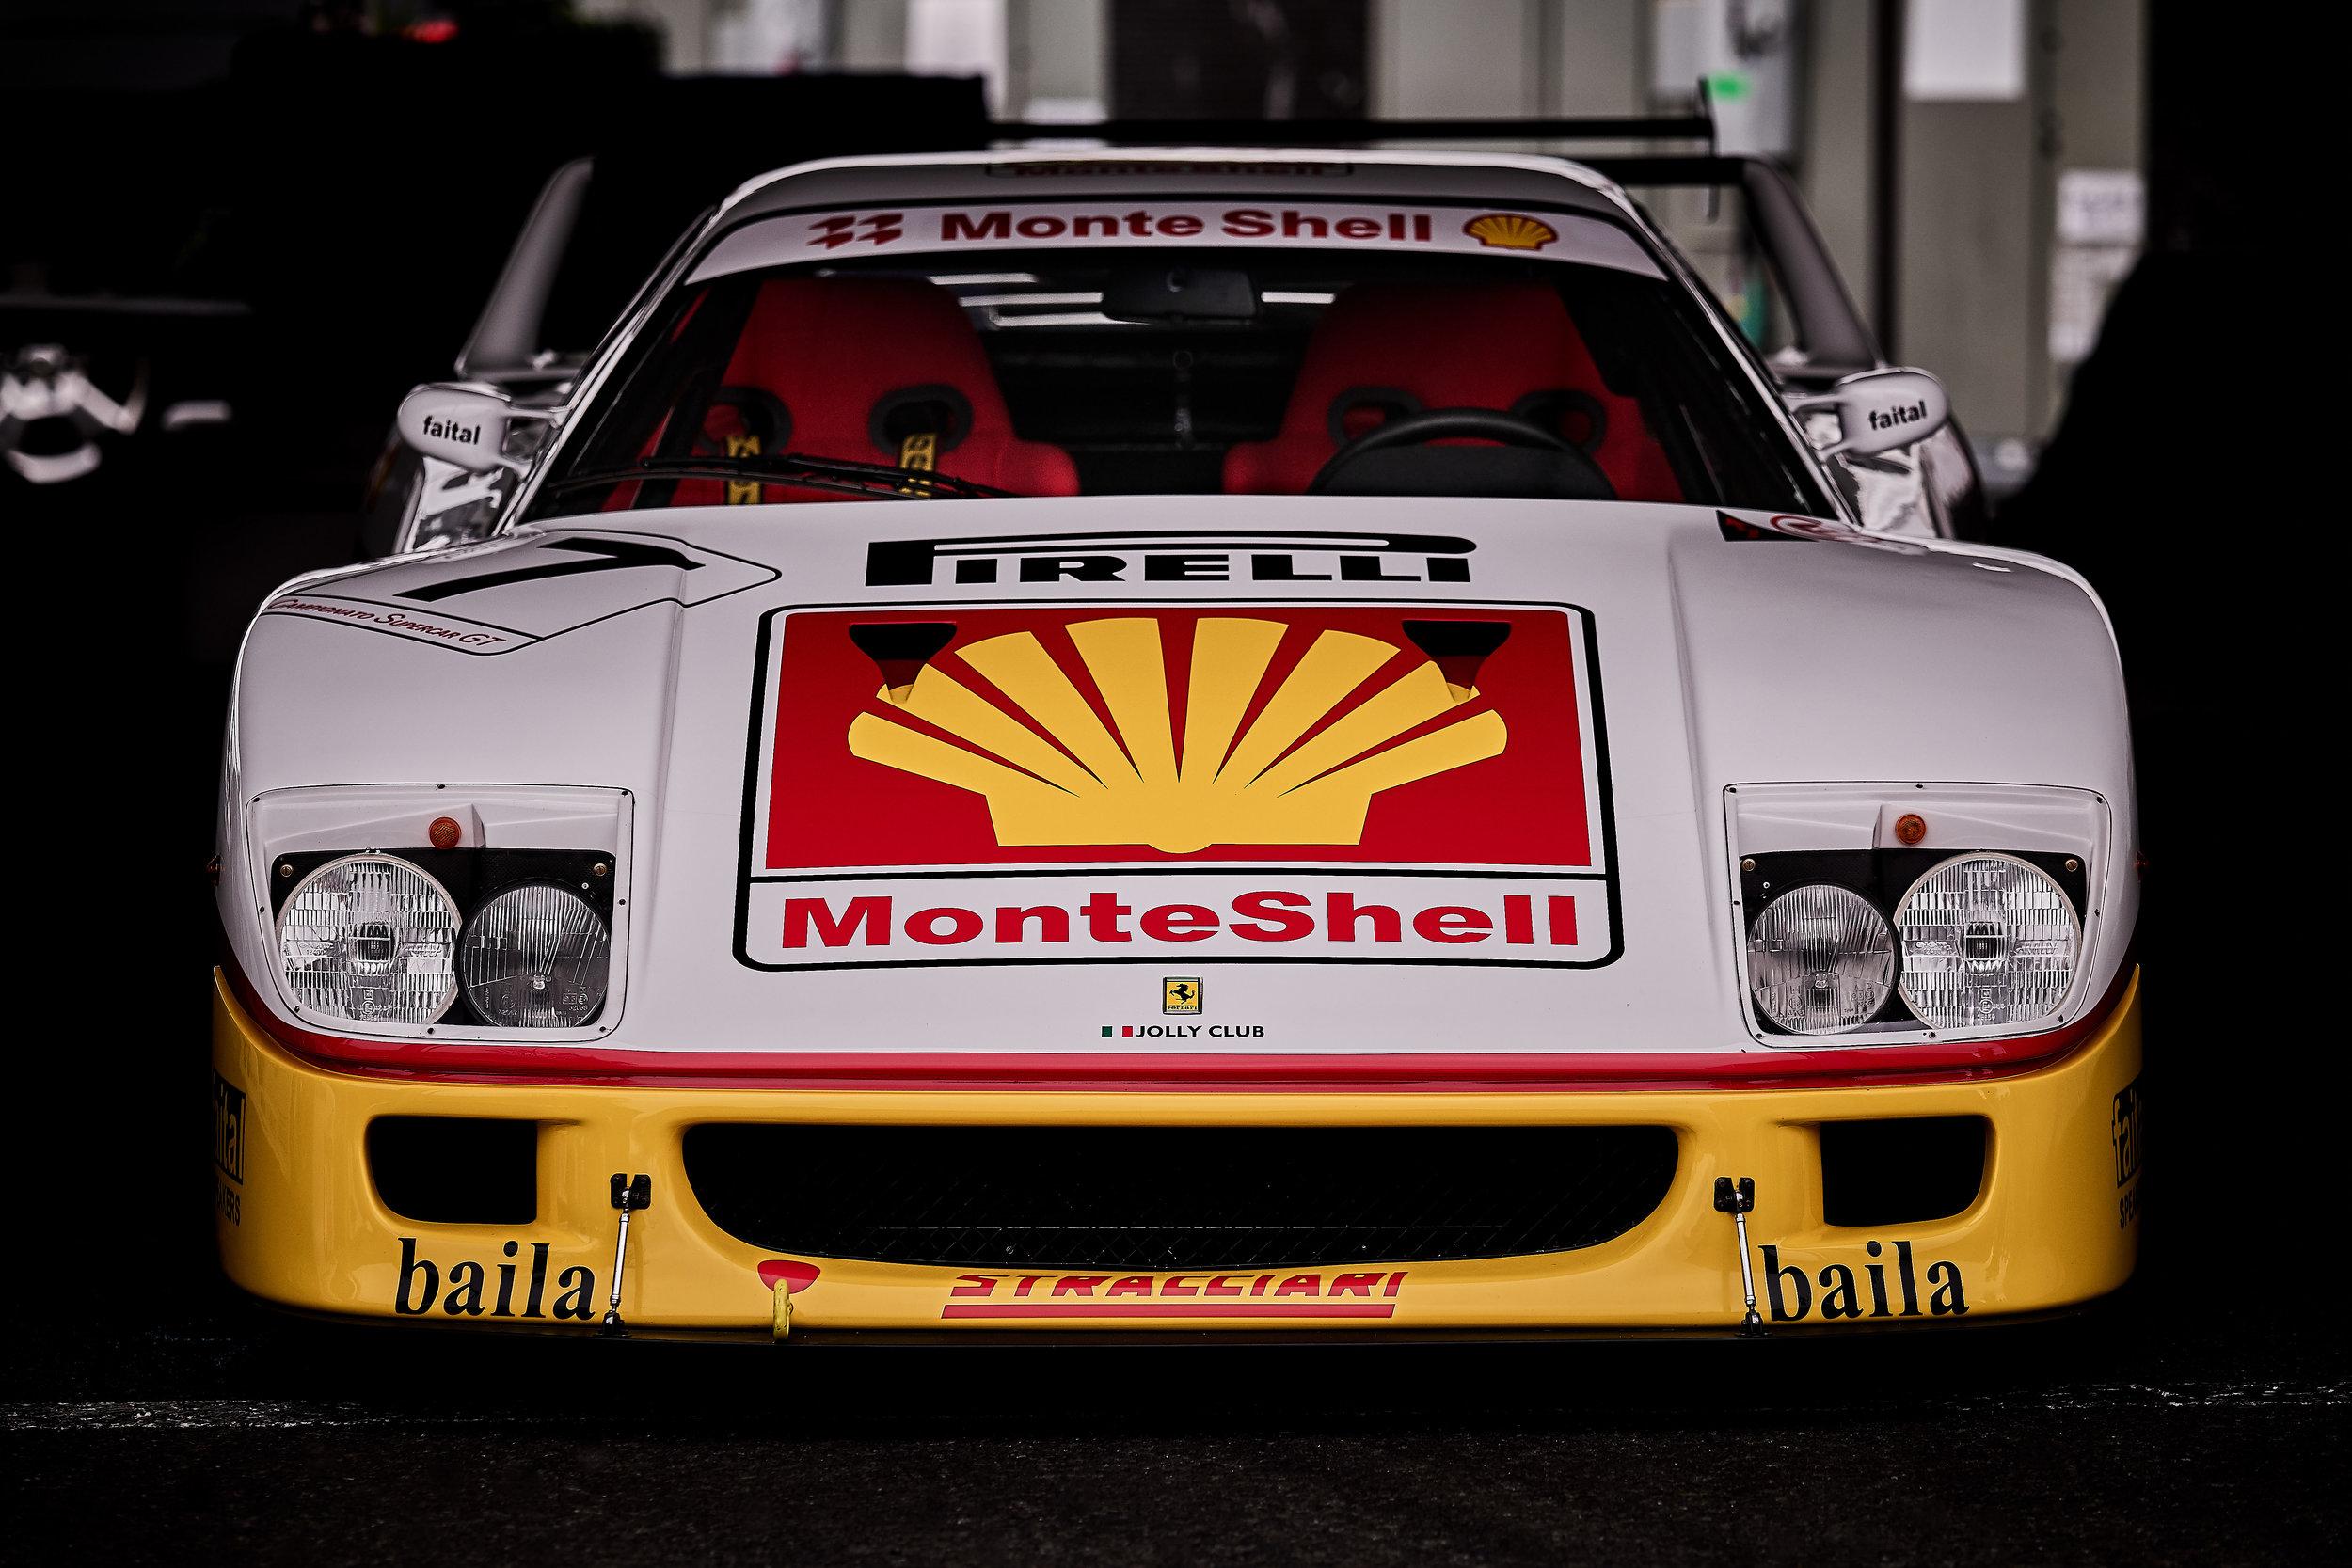 1992 Ferrari F40LM (Type 520)